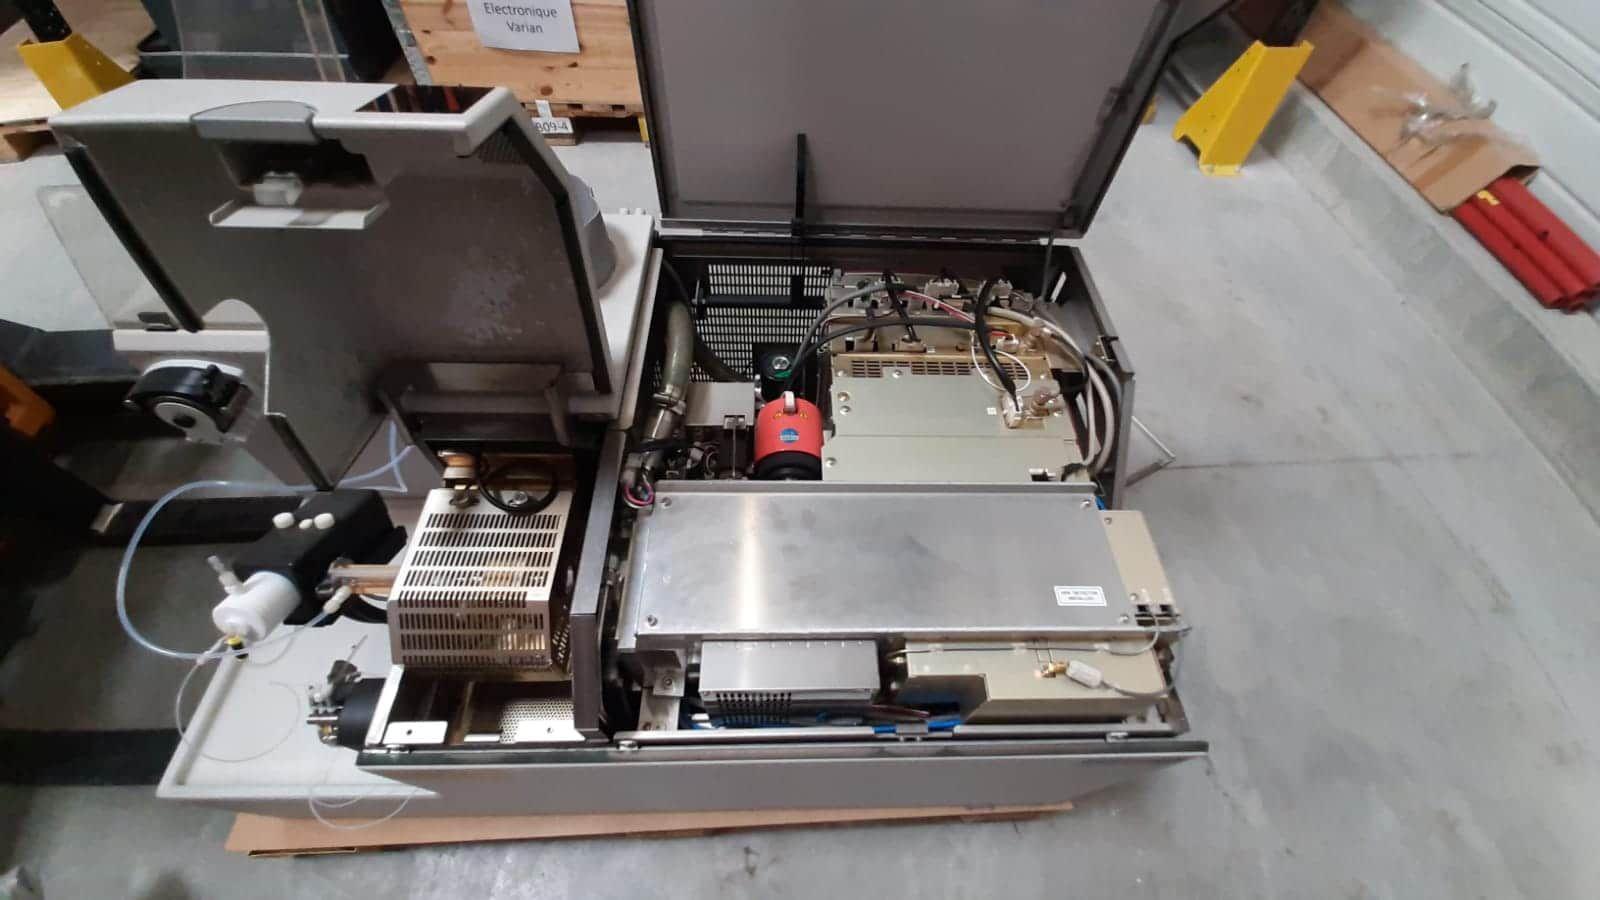 Agilent 7500ce ICP-MS **for parts**